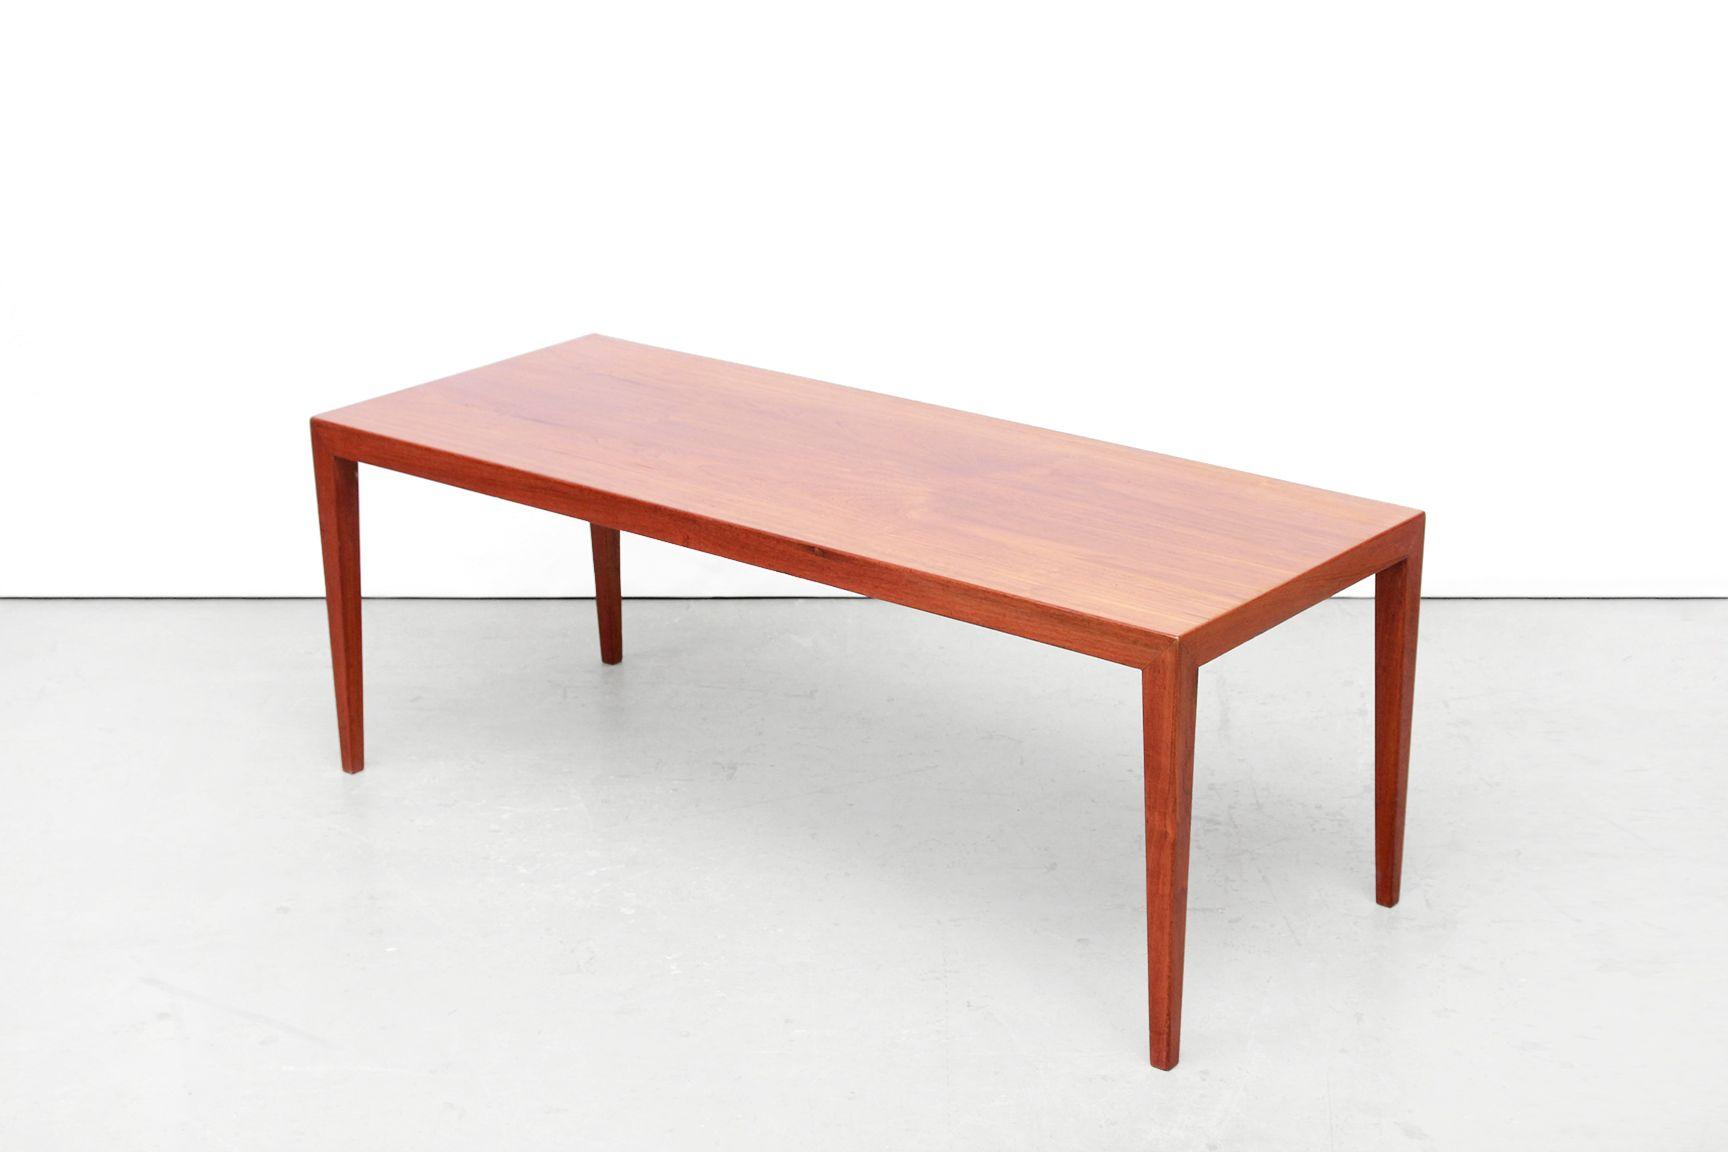 teak coffee table. Danish Teak Coffee Table By Severin Hansen For Haslev Mobelfabrik, 1950s 0